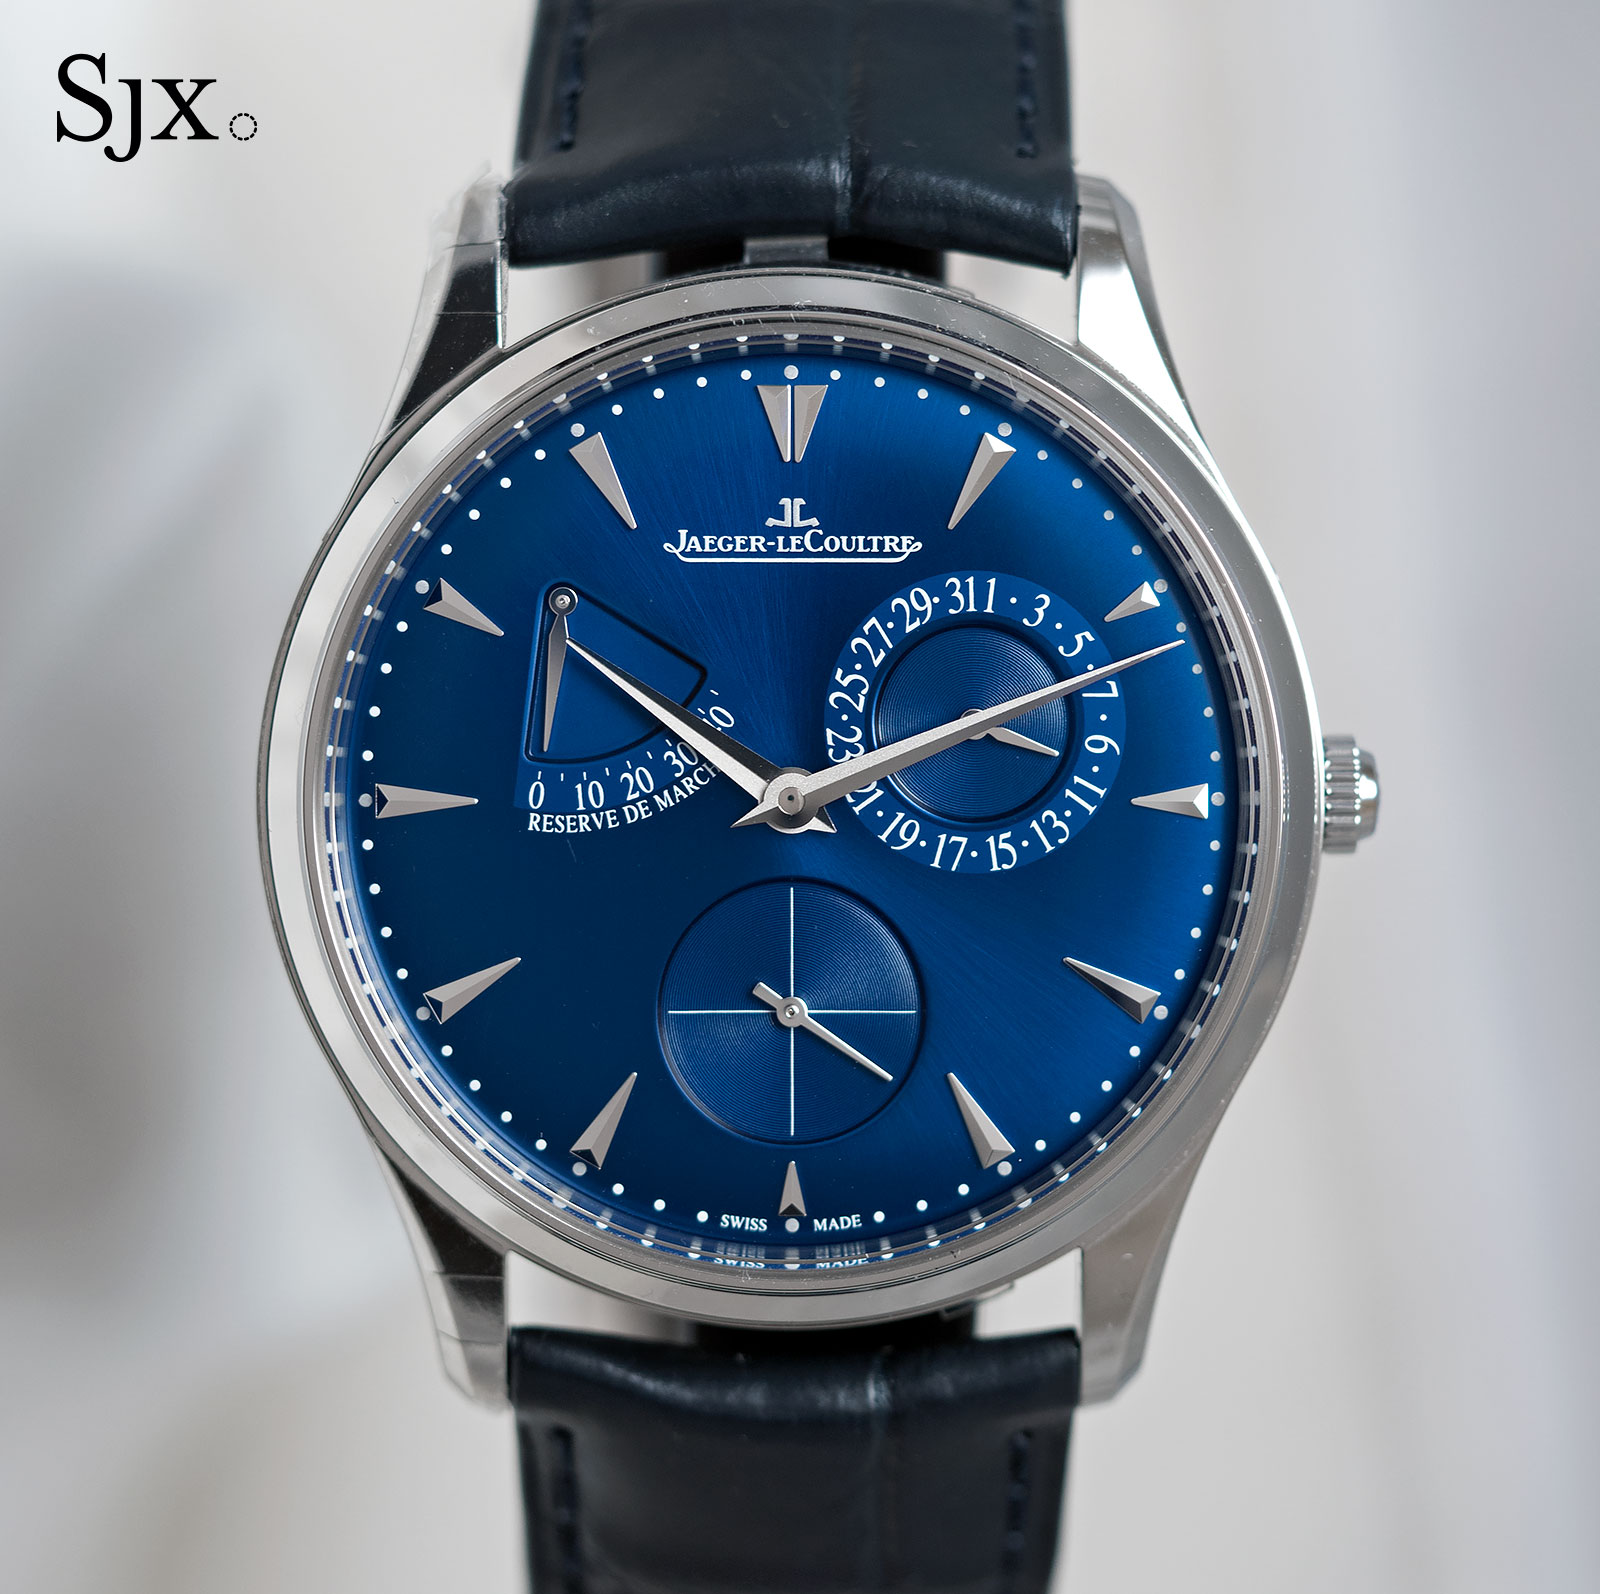 Jaeger-LeCoultre Master Ultra Thin Reserve de marche blue dial 1